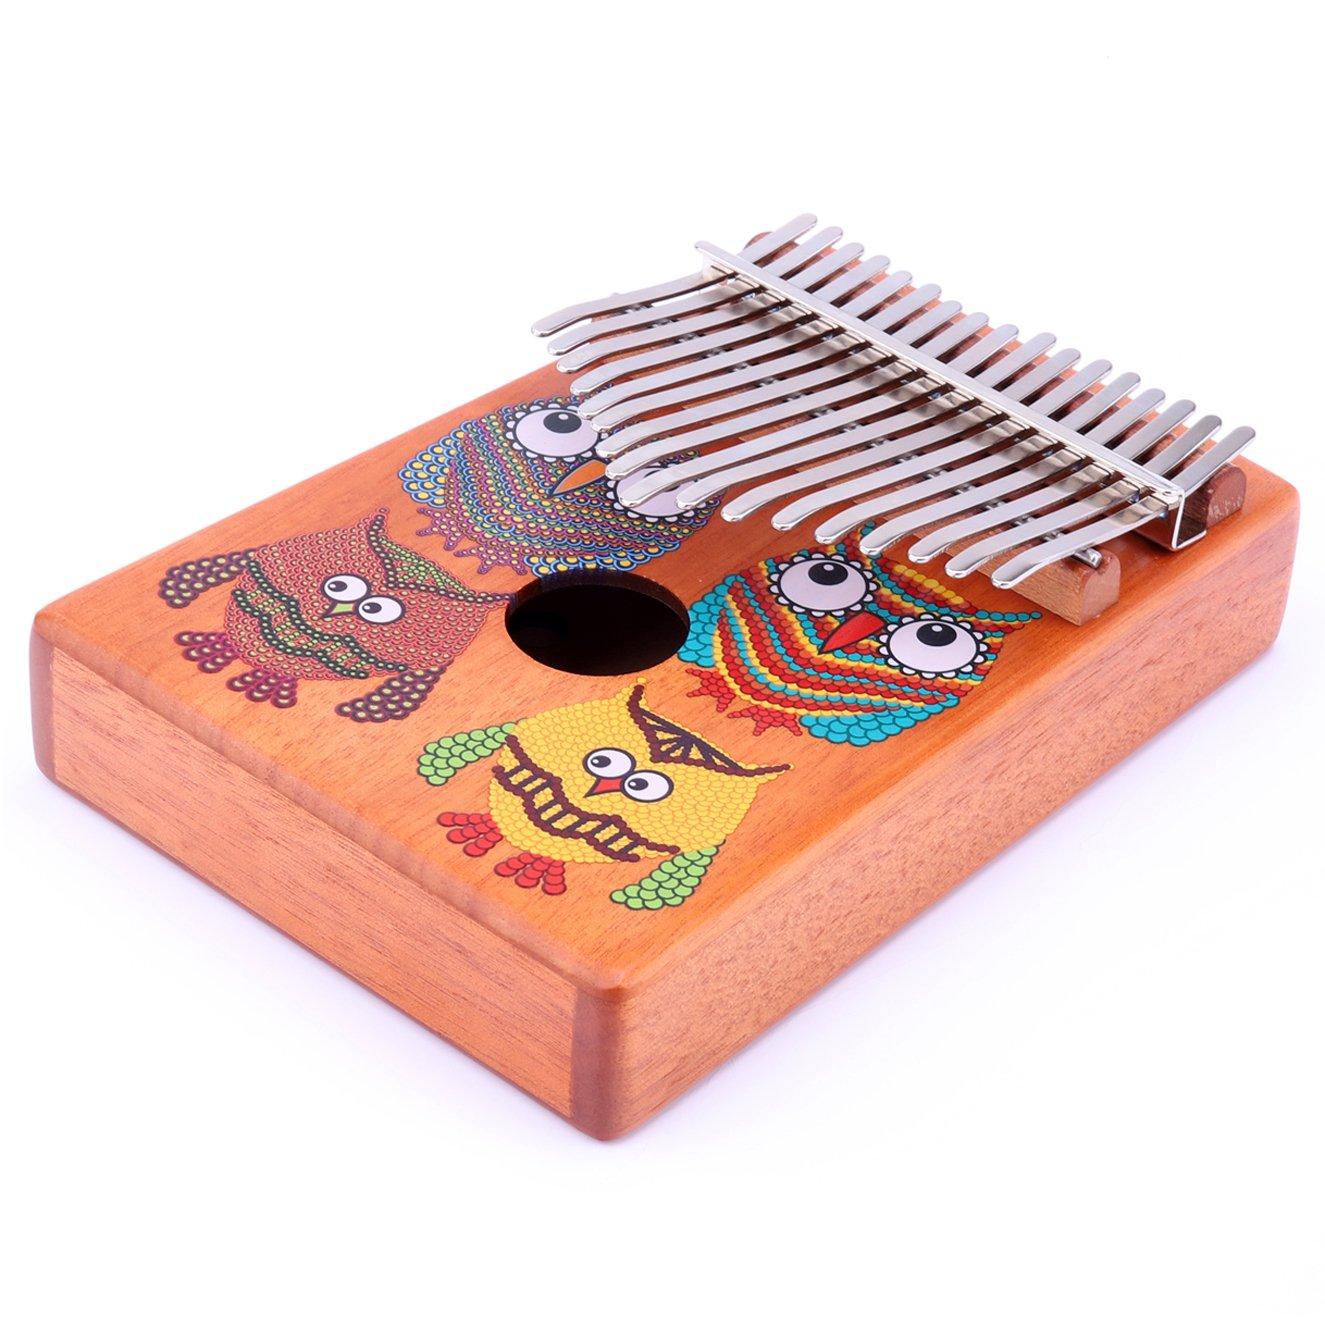 VI VICTORY 17 Key Mahogany Kalimba Colorful African Thumb Piano Finger Percussion Keyboard Music Instruments - Owl by VI VICTORY (Image #6)